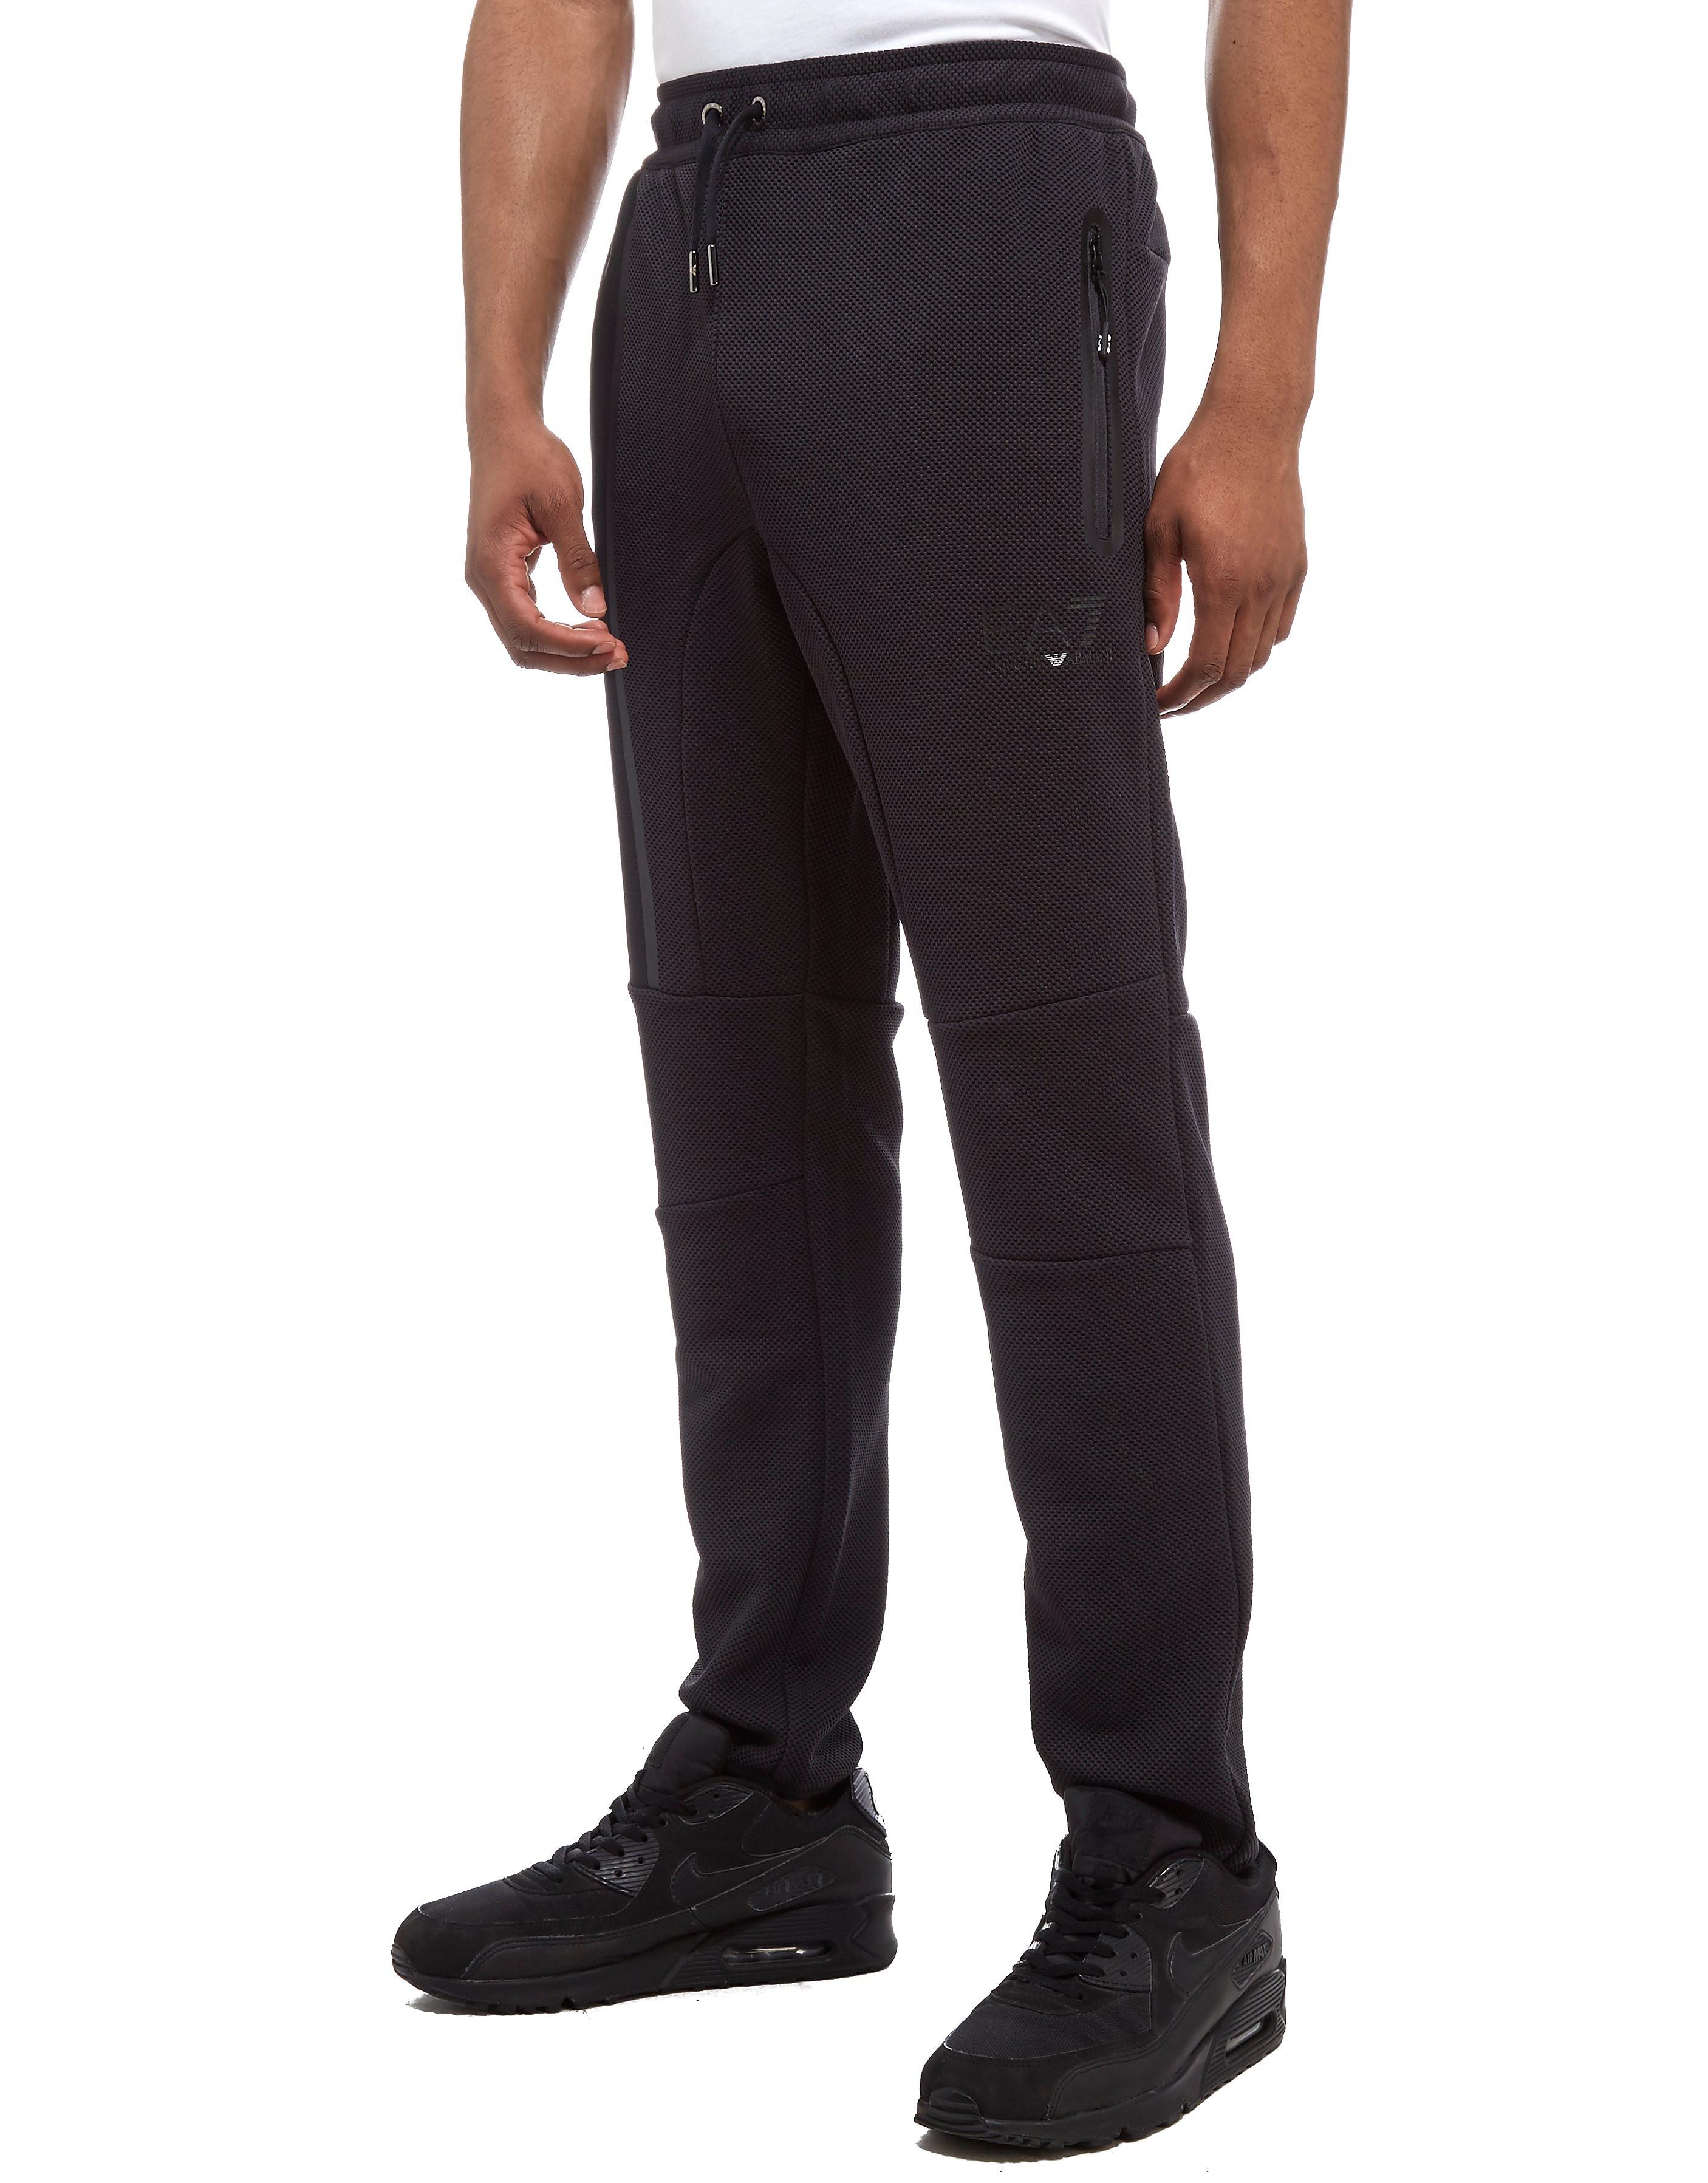 Emporio Armani EA7 Evolution Mesh Pants Heren